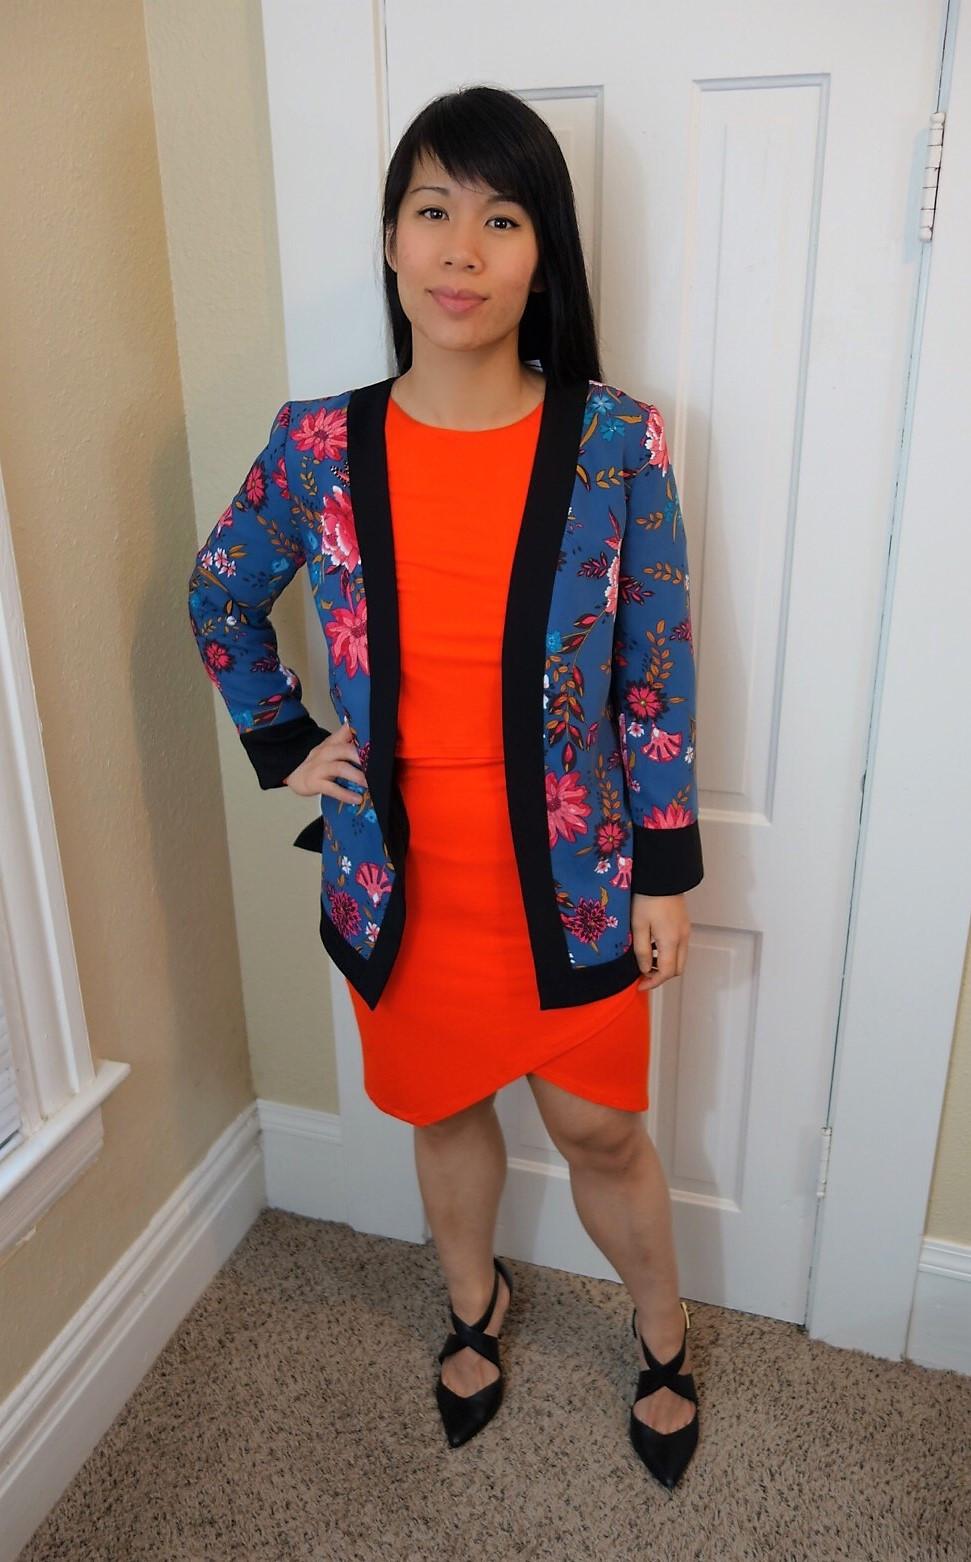 Floral Blazer Orange Dress Layered Look